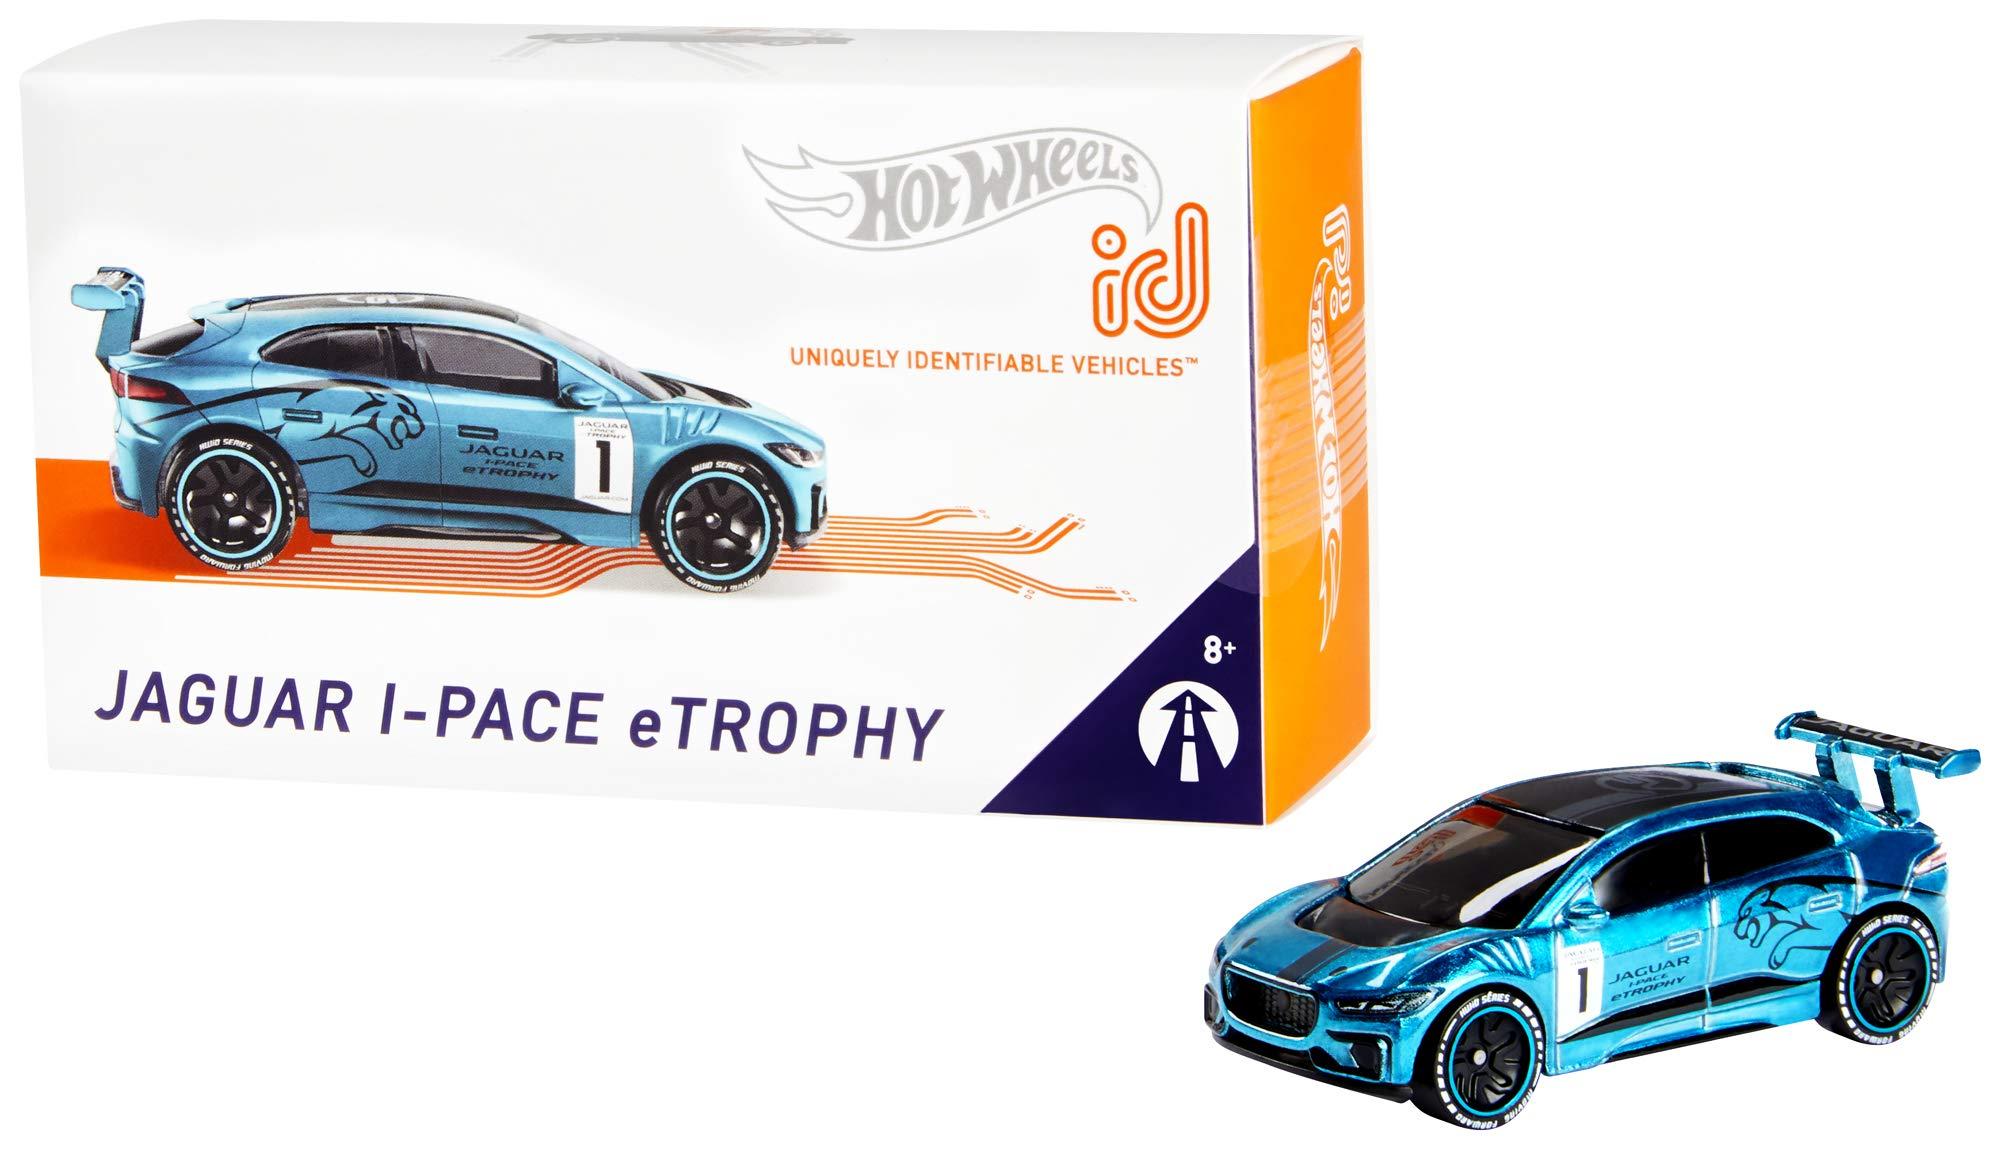 Hot Wheels id Jaguar i-Pace eTrophy